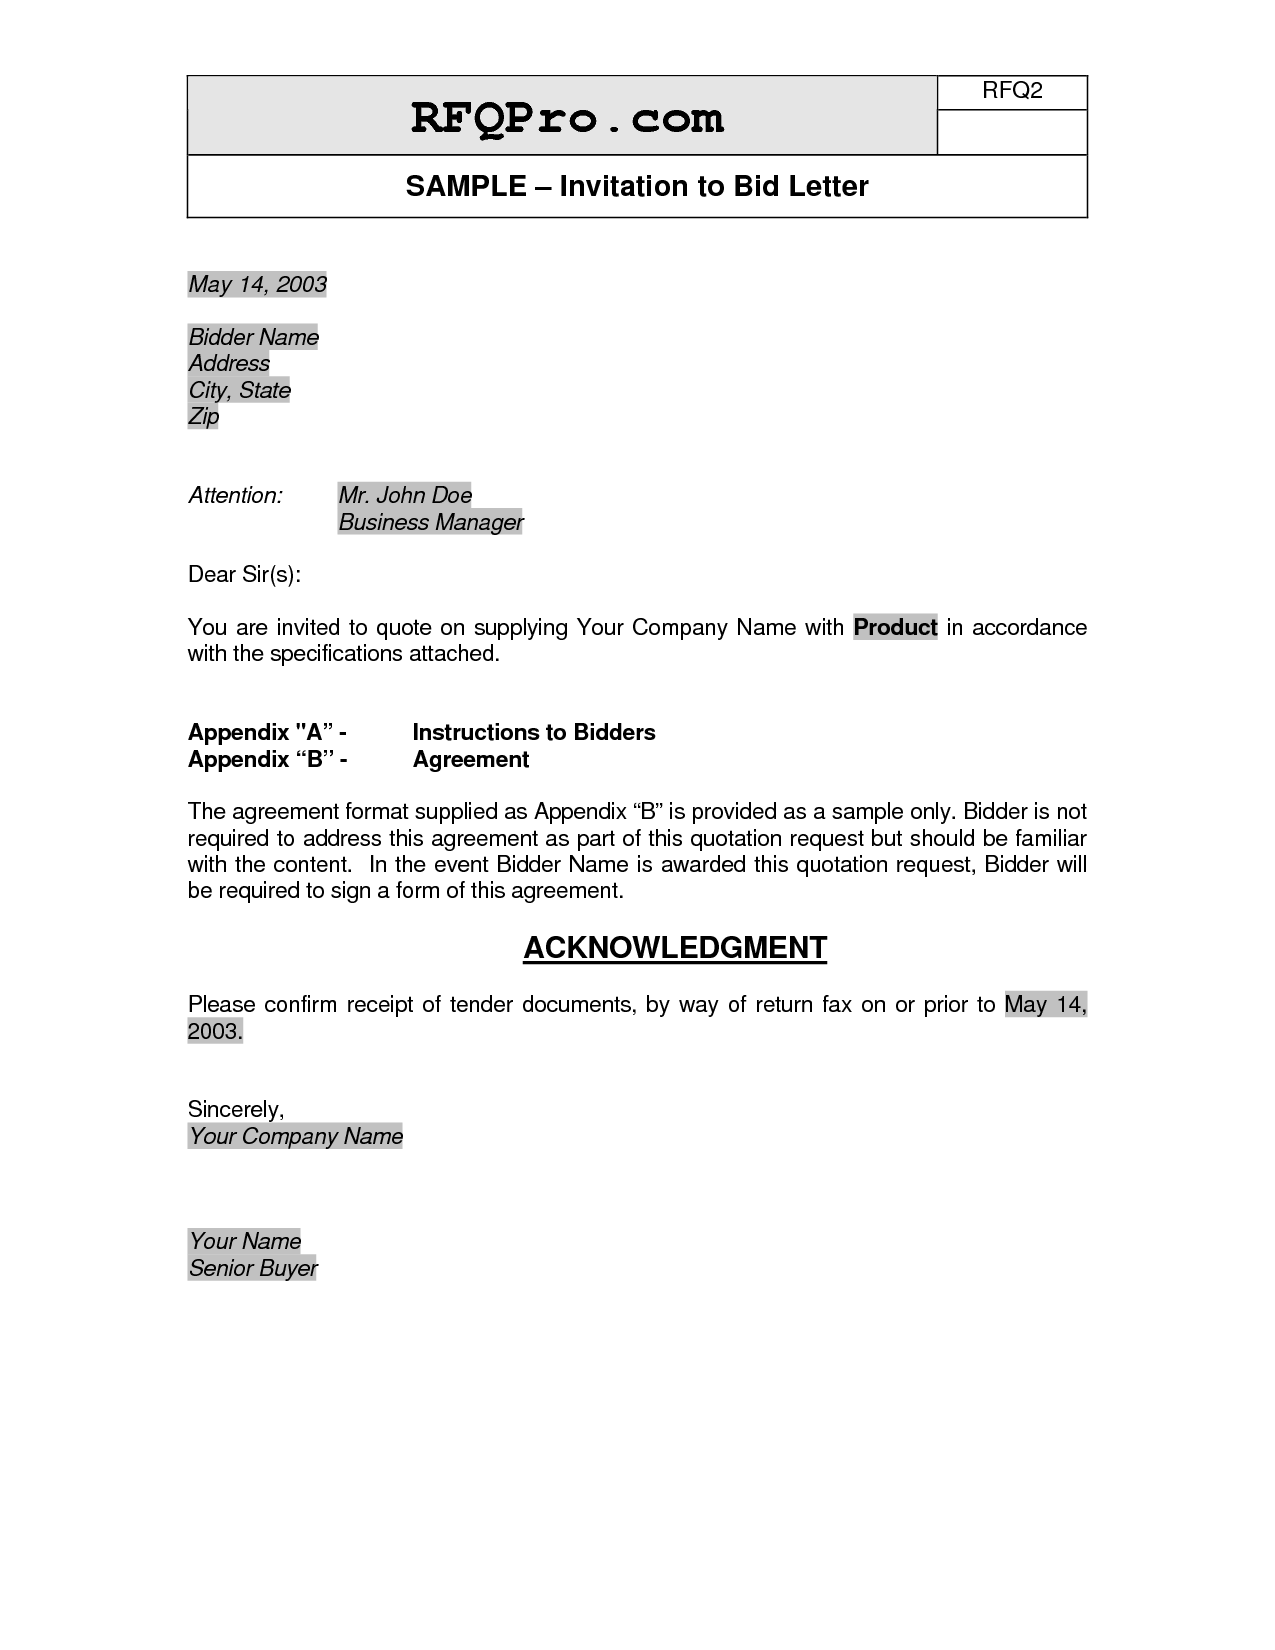 Business Invitation Letter Format Fair Response Letter To Bid Invitation Membership Decline Letter This .